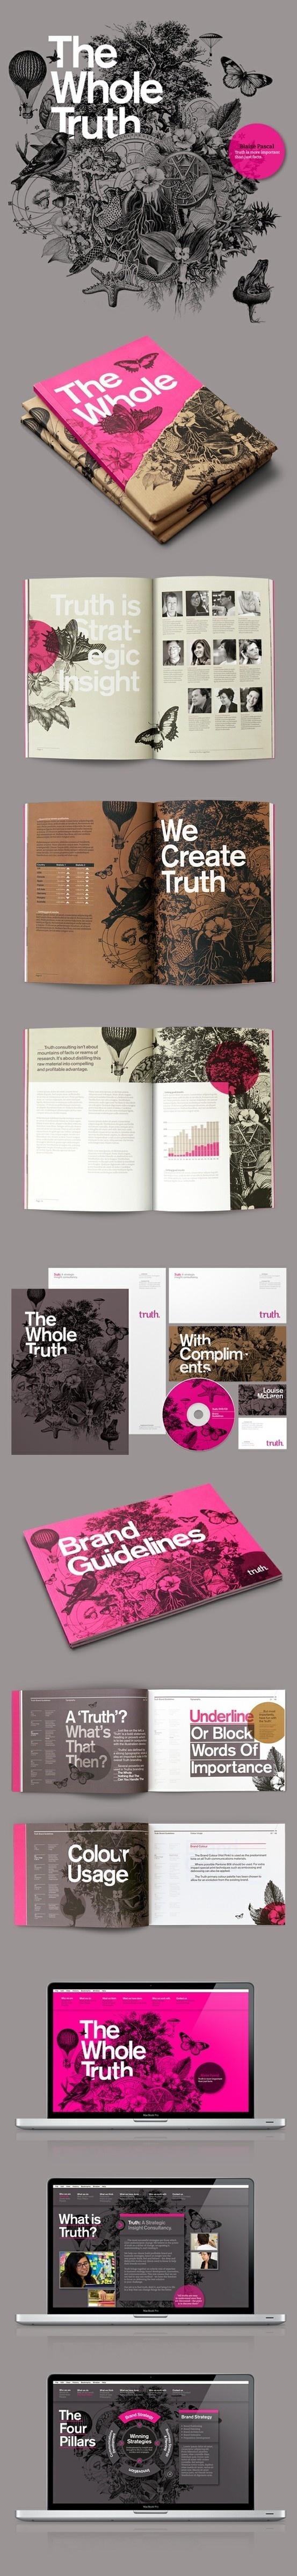 Truth Branding by Socio Design #truth #design #socio #branding